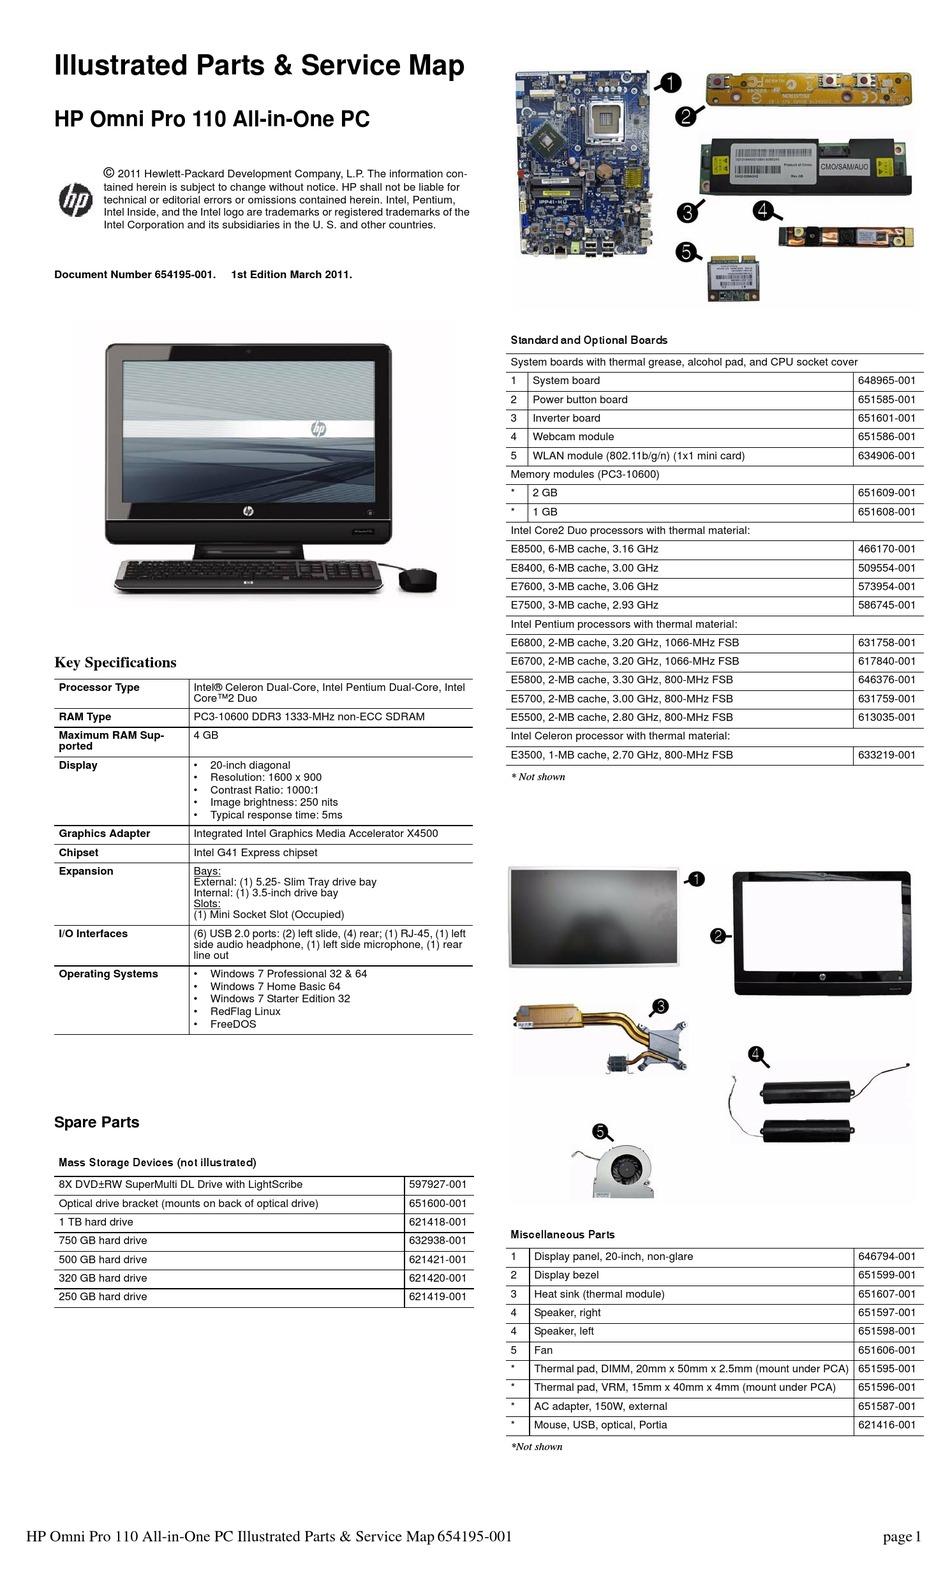 HP OMNI PRO 110 ILLUSTRATED PARTS & SERVICE MAP Pdf